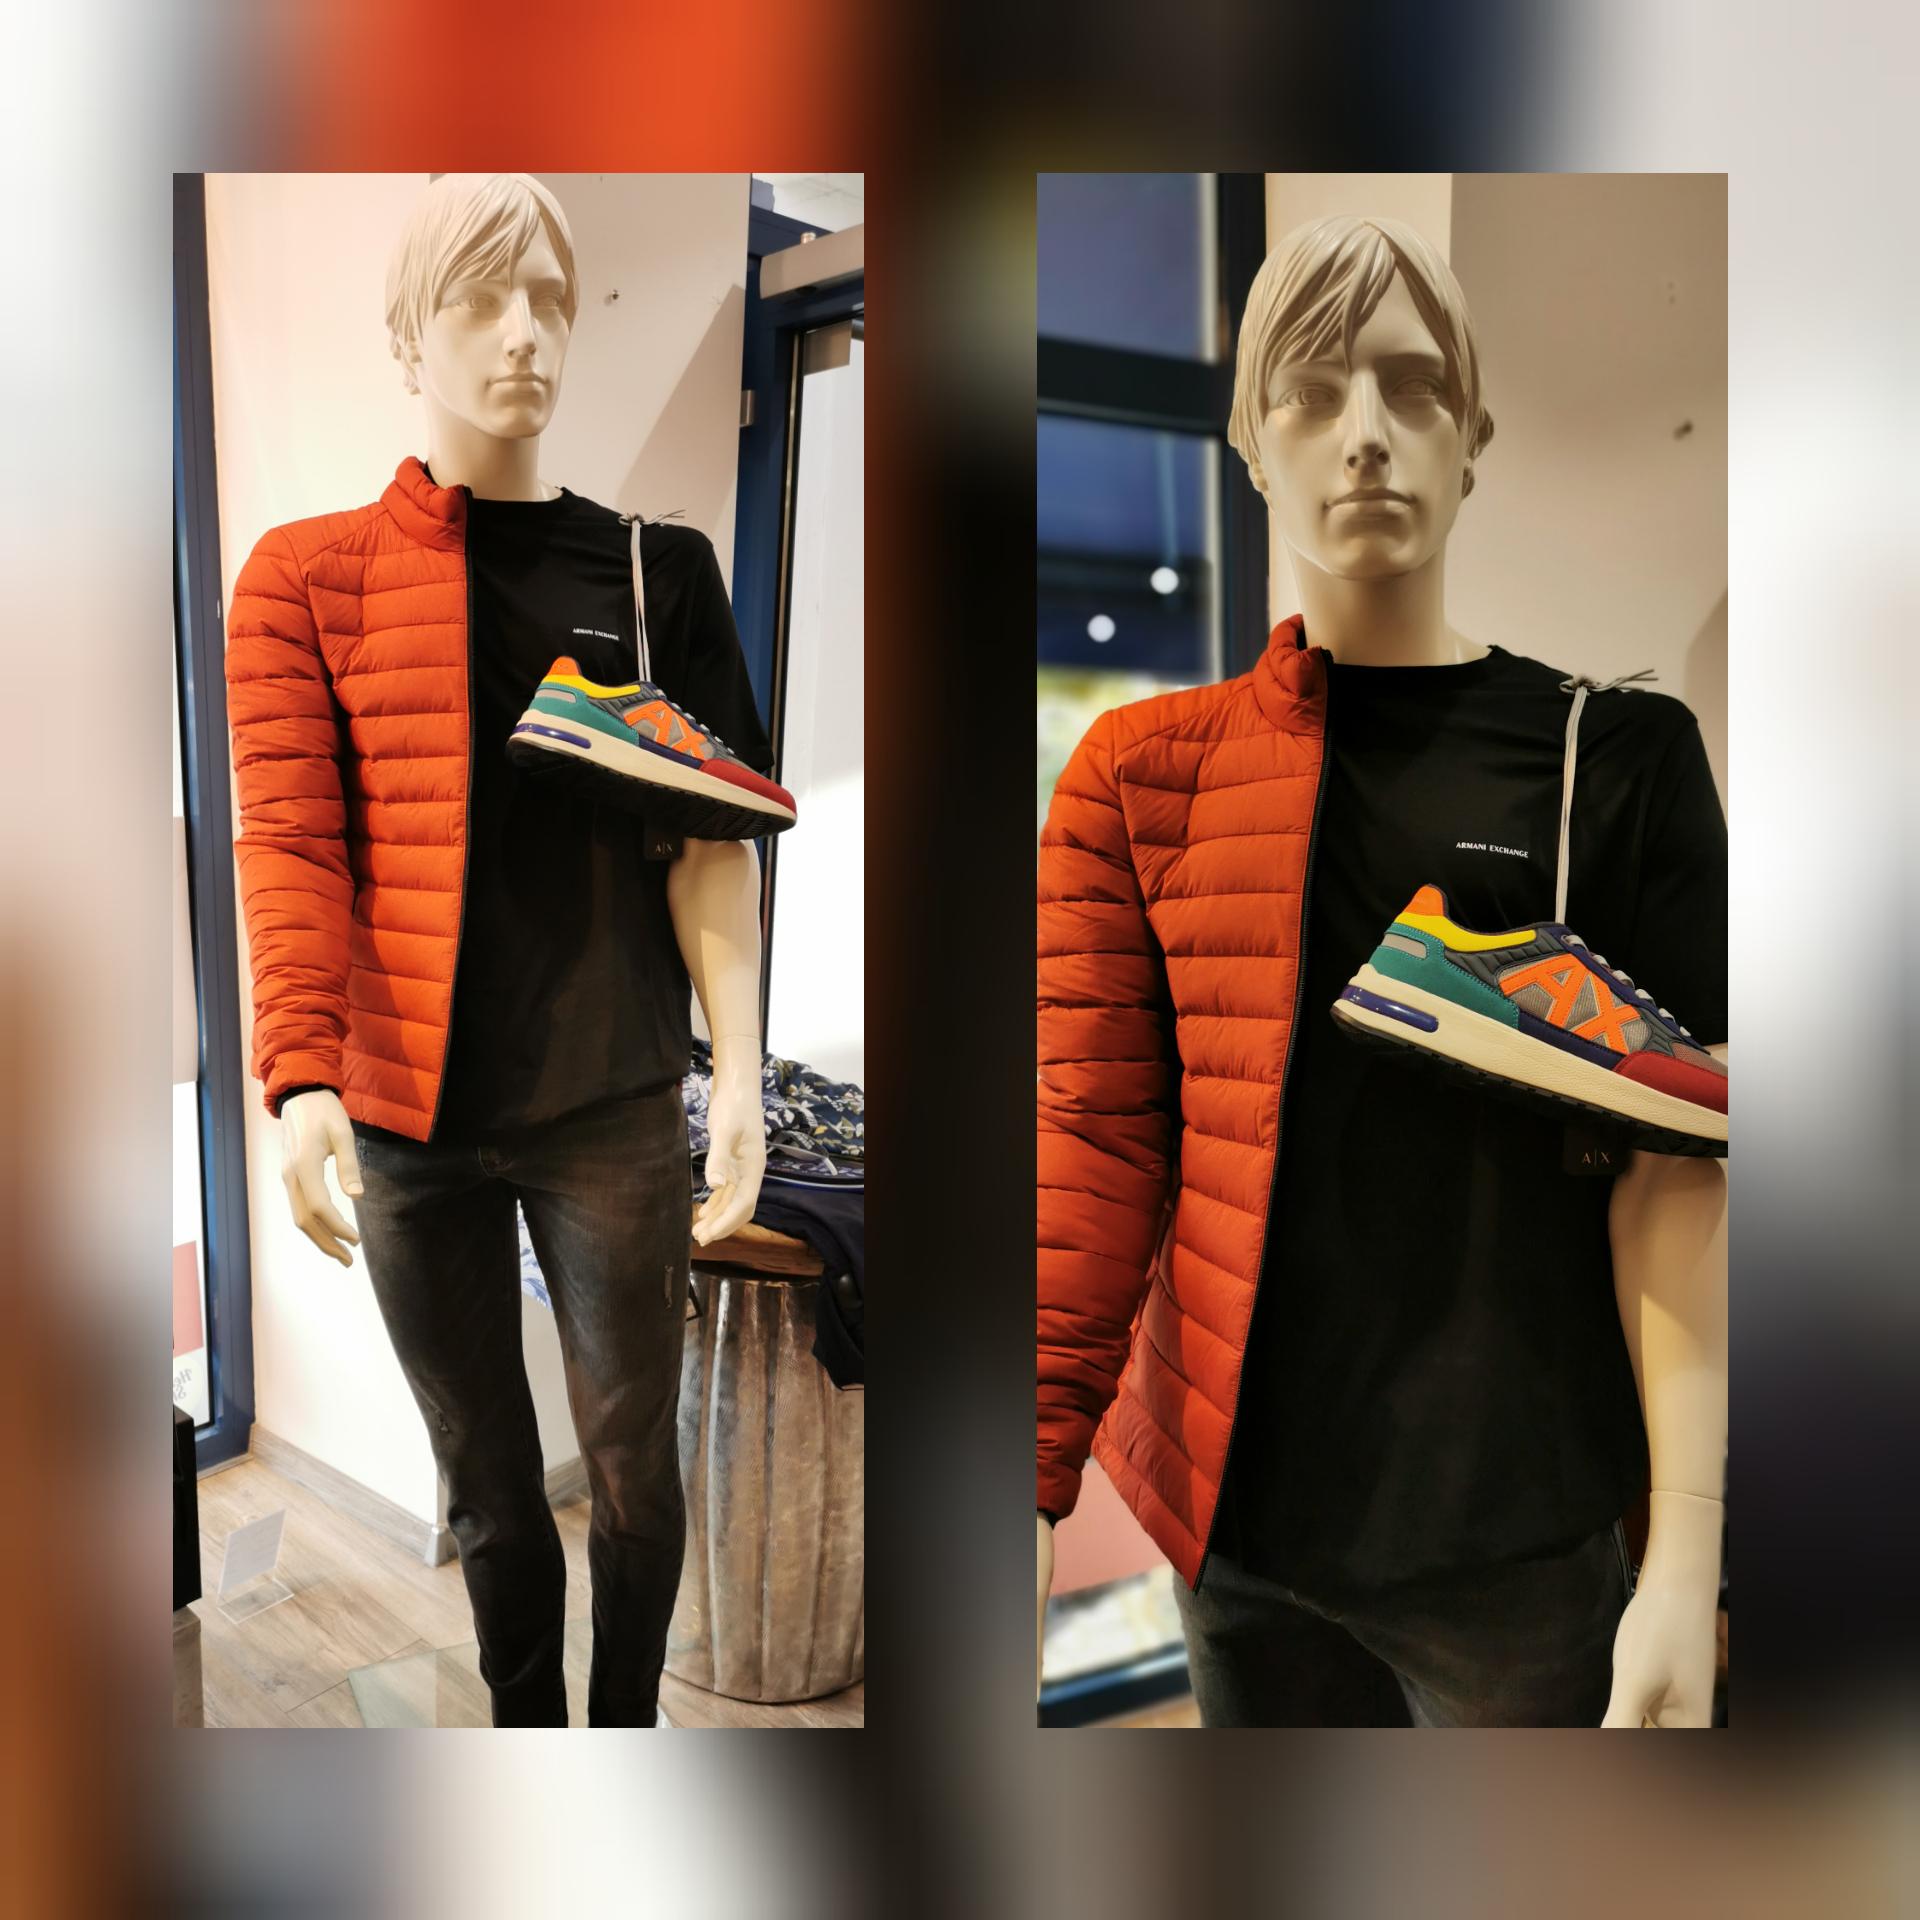 Jacke Ecoalf, Shirt, Hose Schuhe Armani